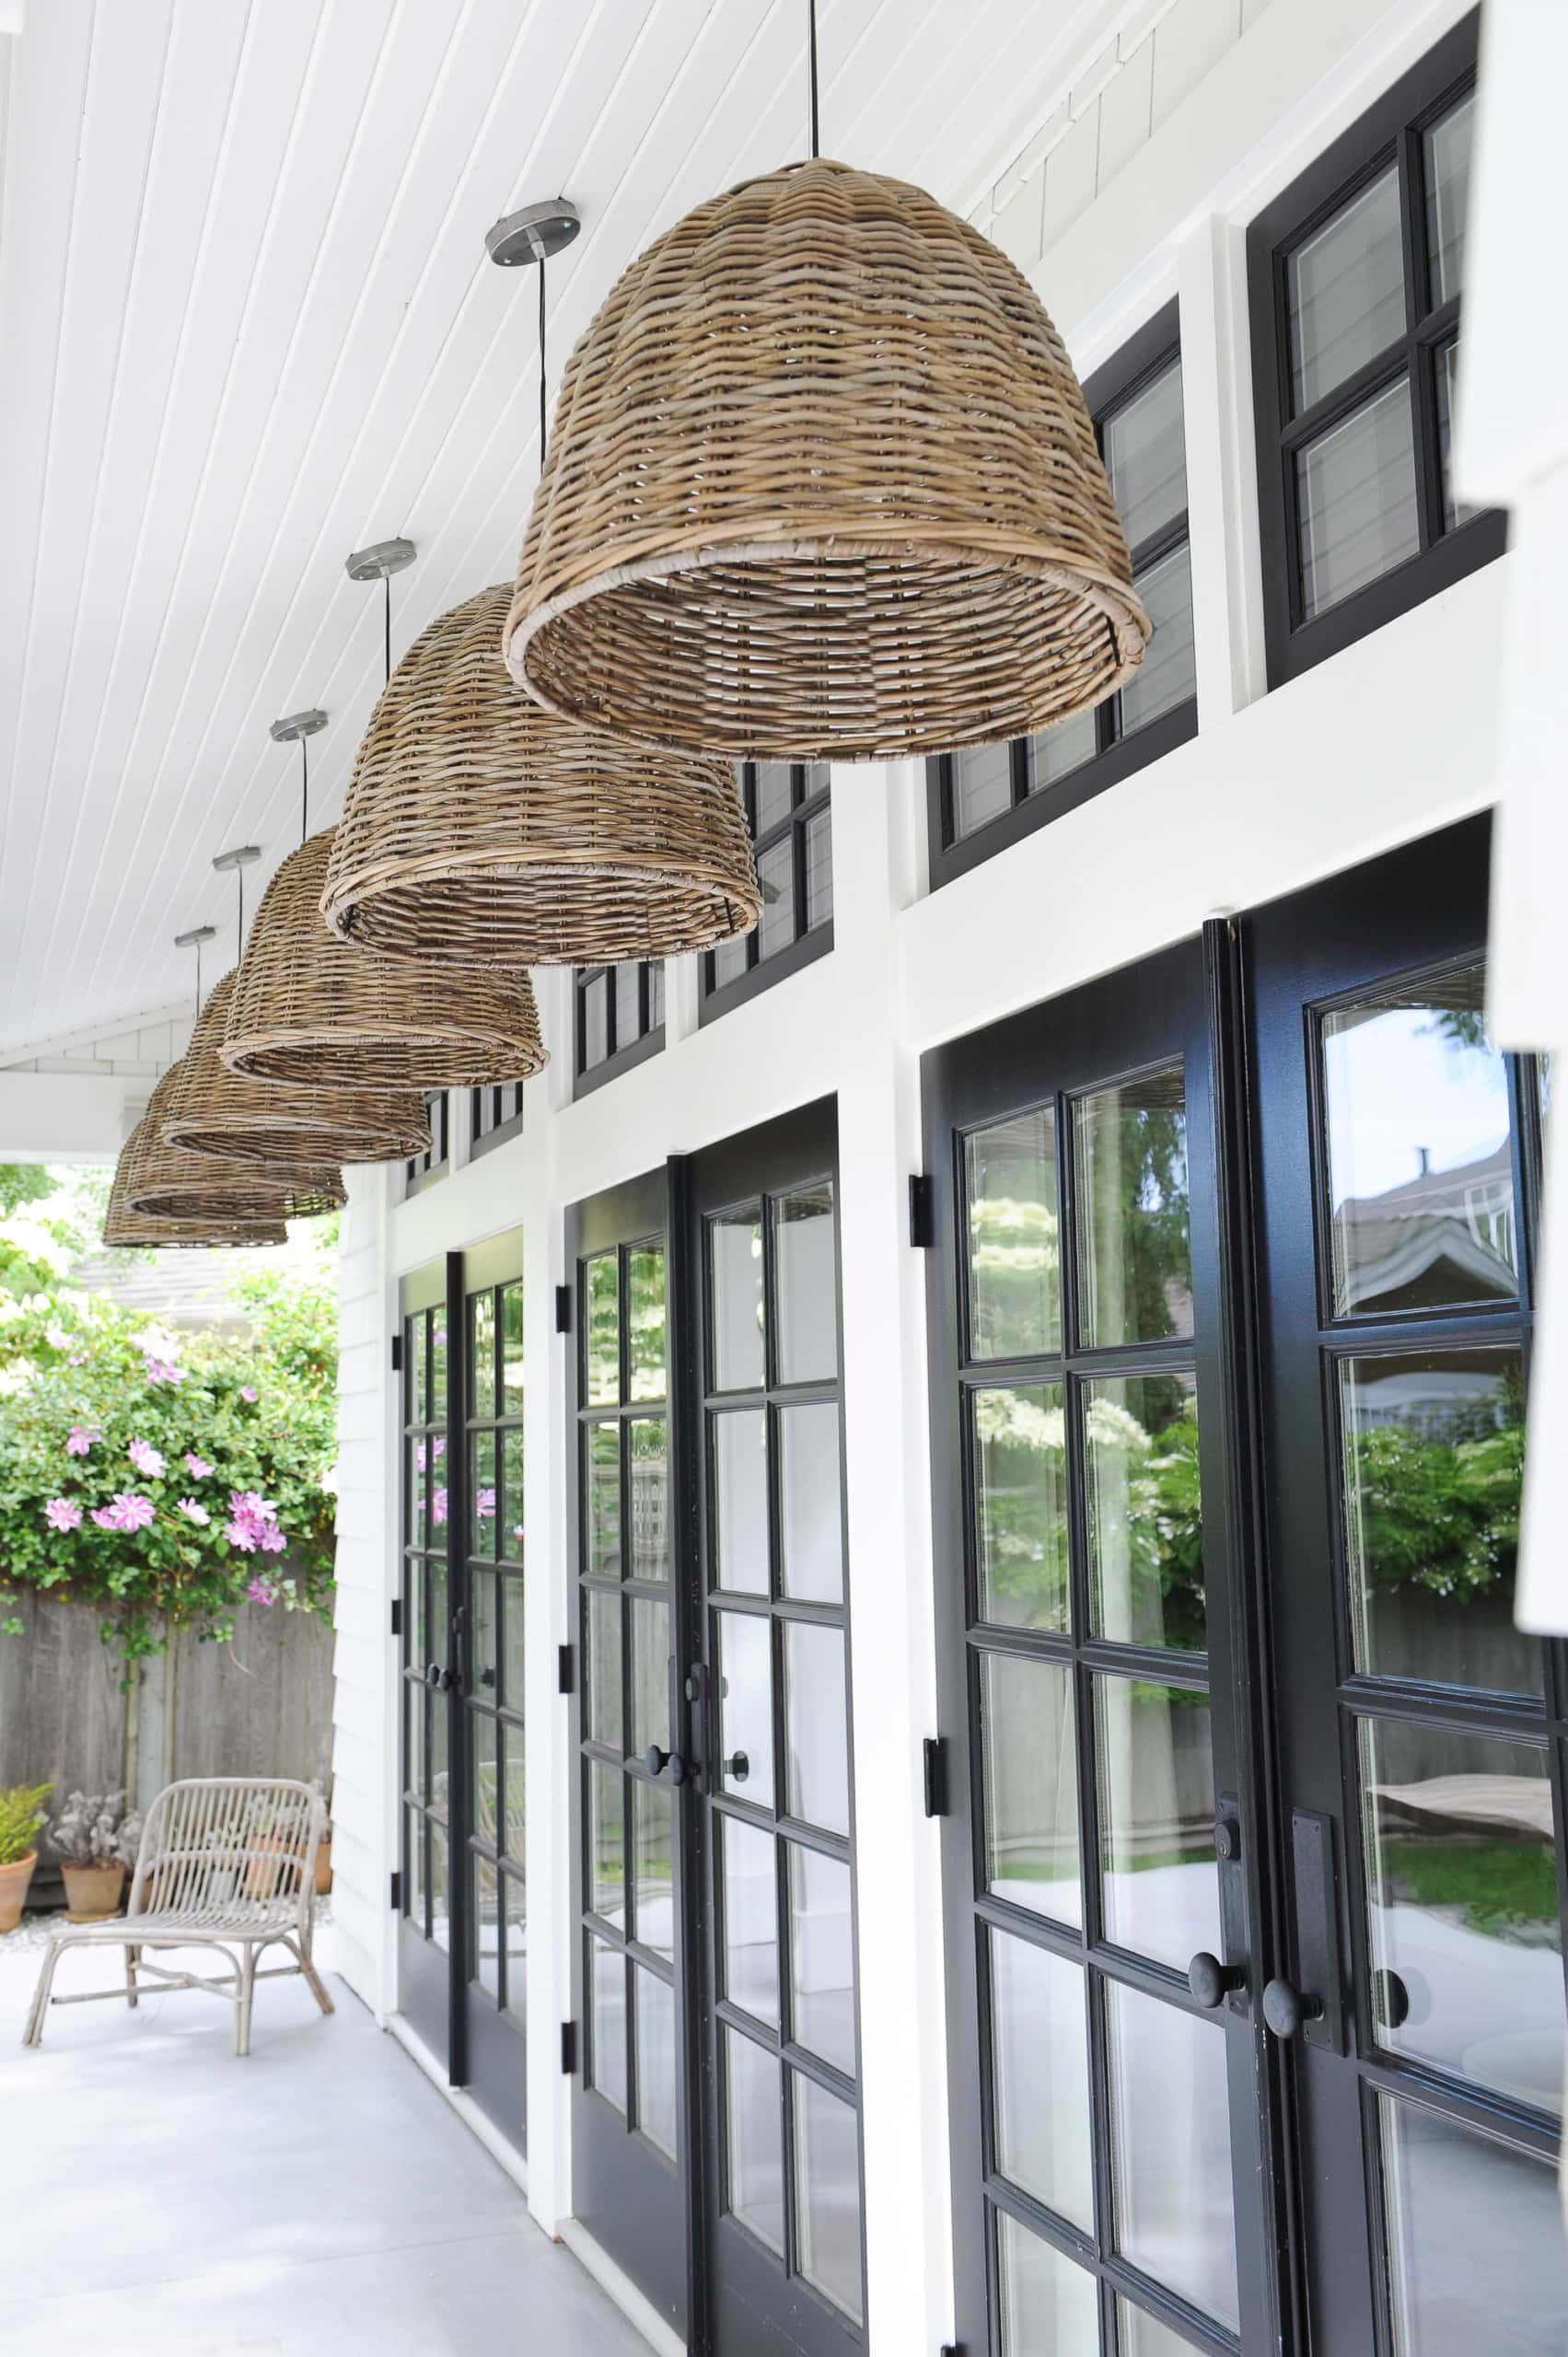 Hanging pendants outdoors